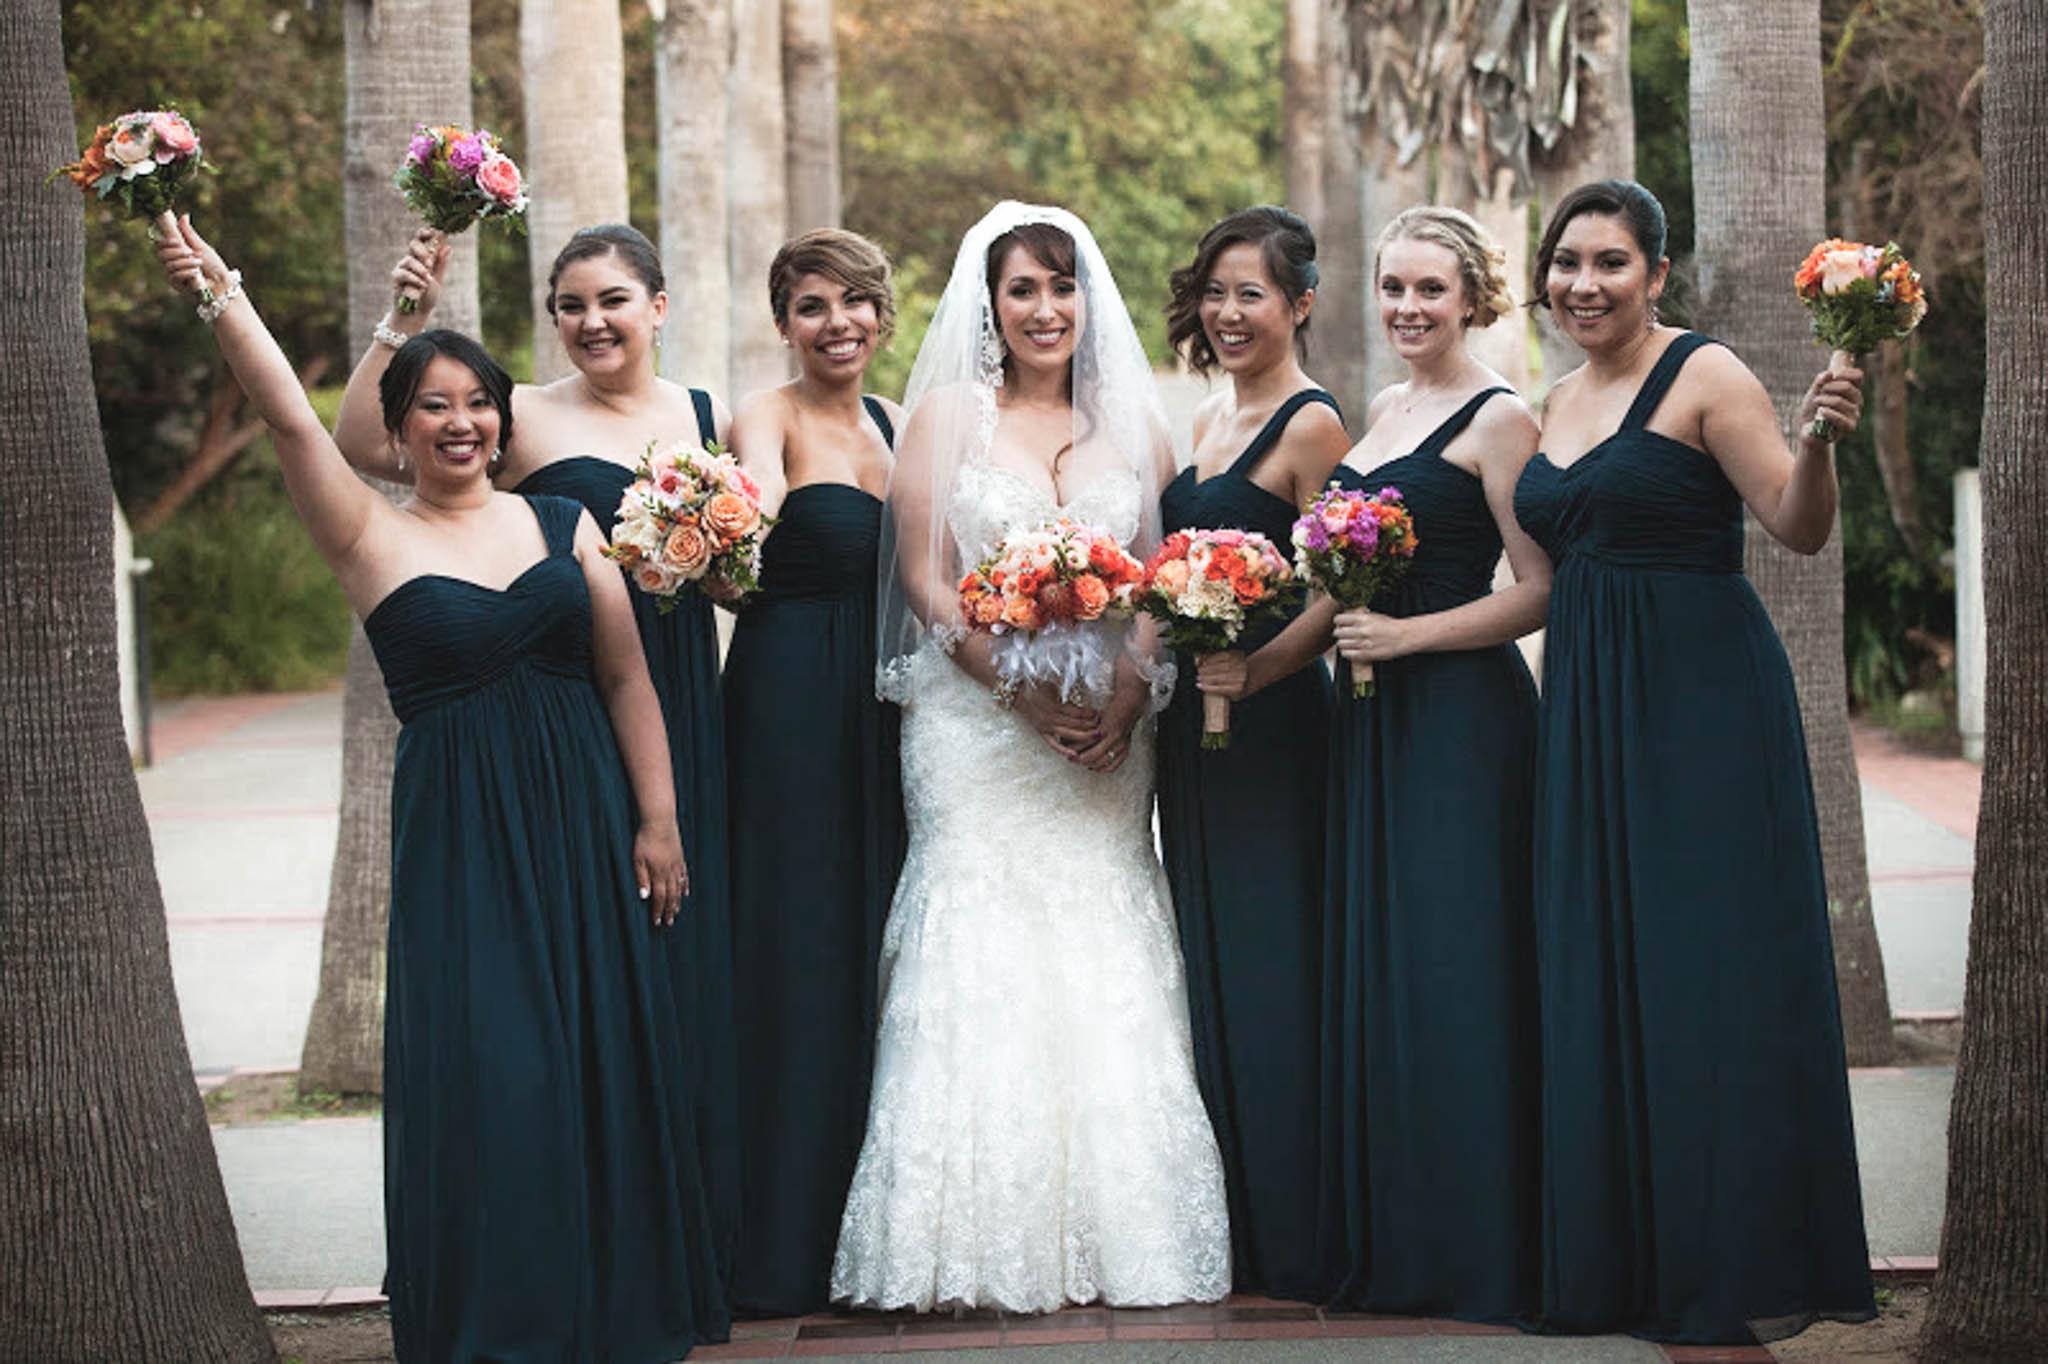 Vanessa-Will-Wedding-399.jpg